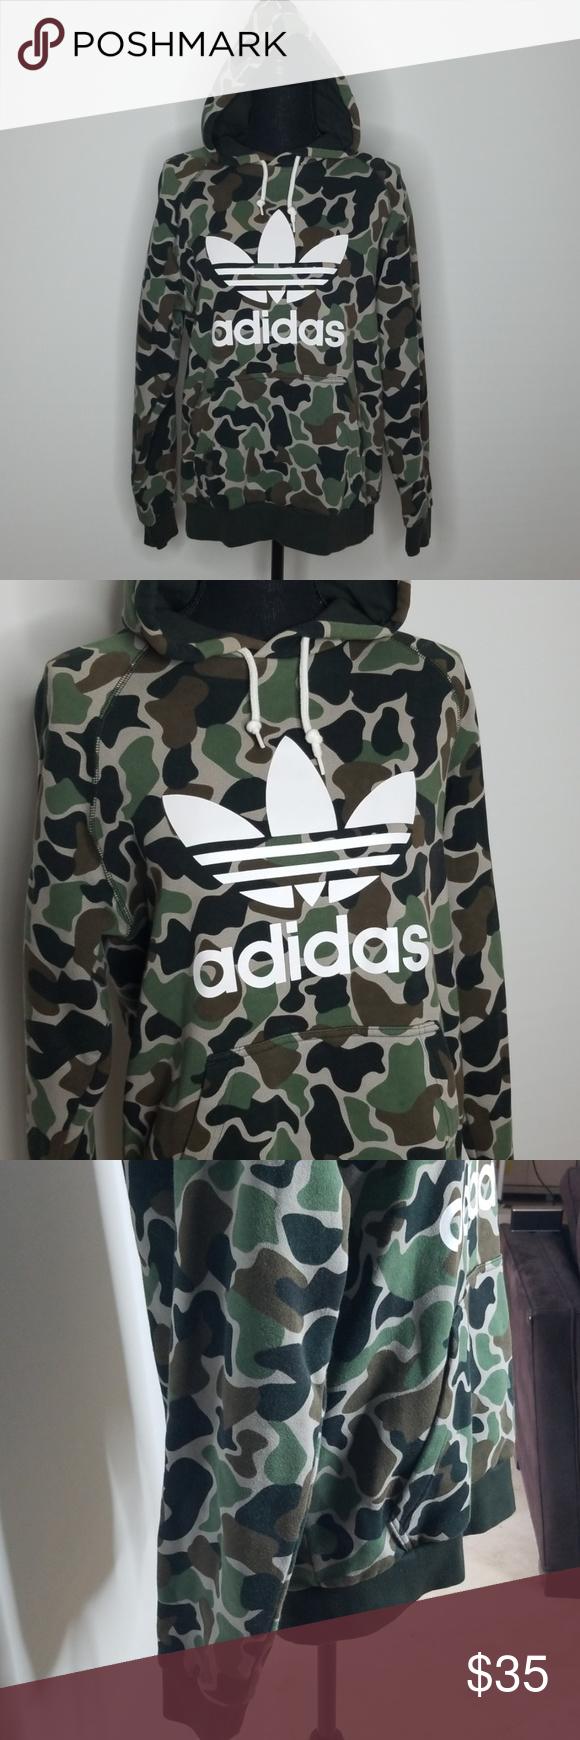 Adidas Camo Sweatshirt Medium 3 For 25 Camo Sweatshirt Adidas Camo Sweatshirts [ 1740 x 580 Pixel ]